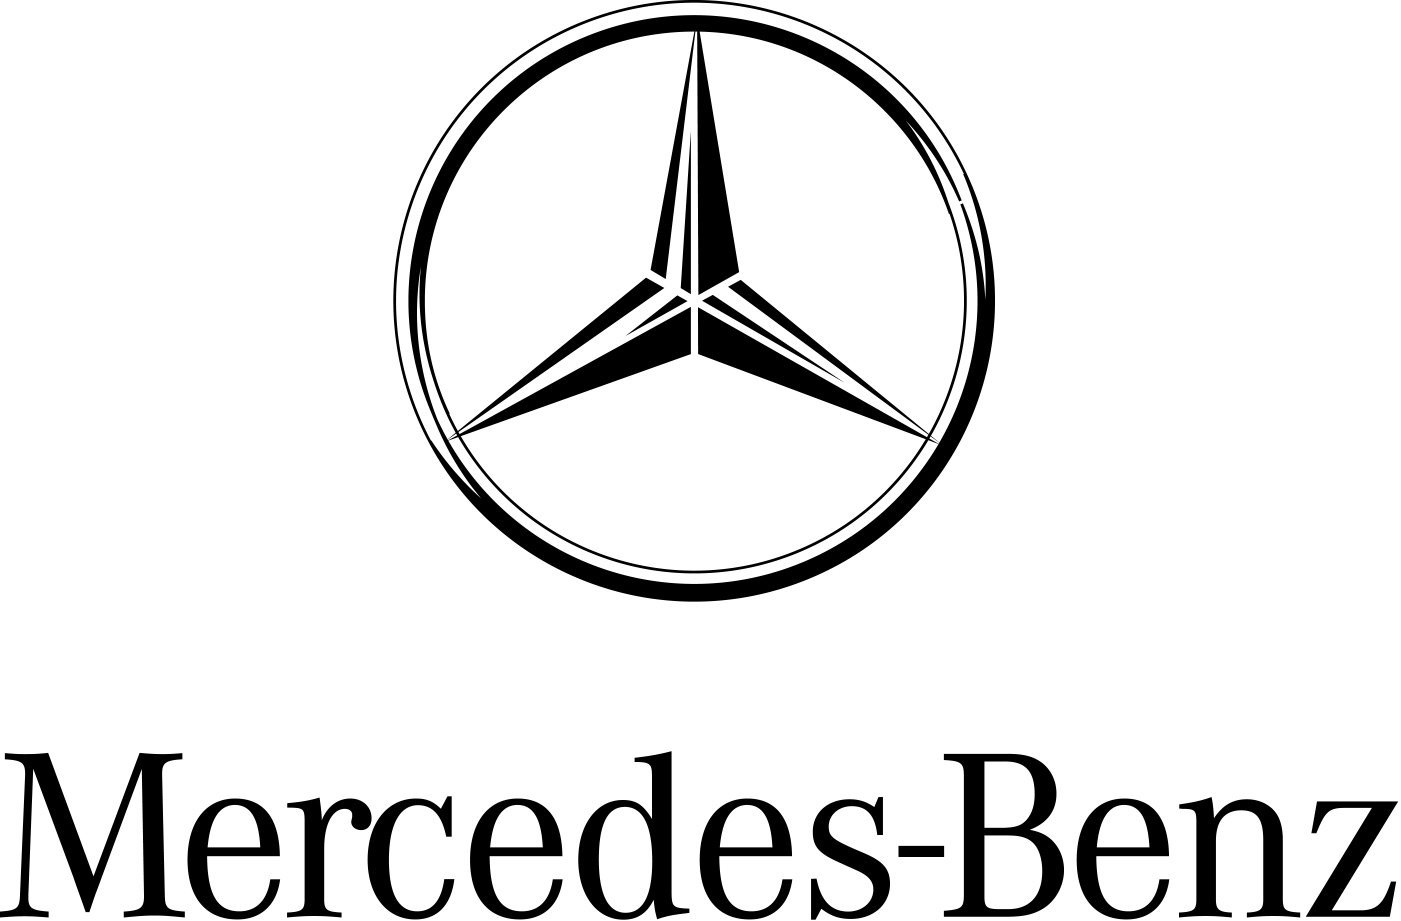 German Car Logos - World Cars Brands